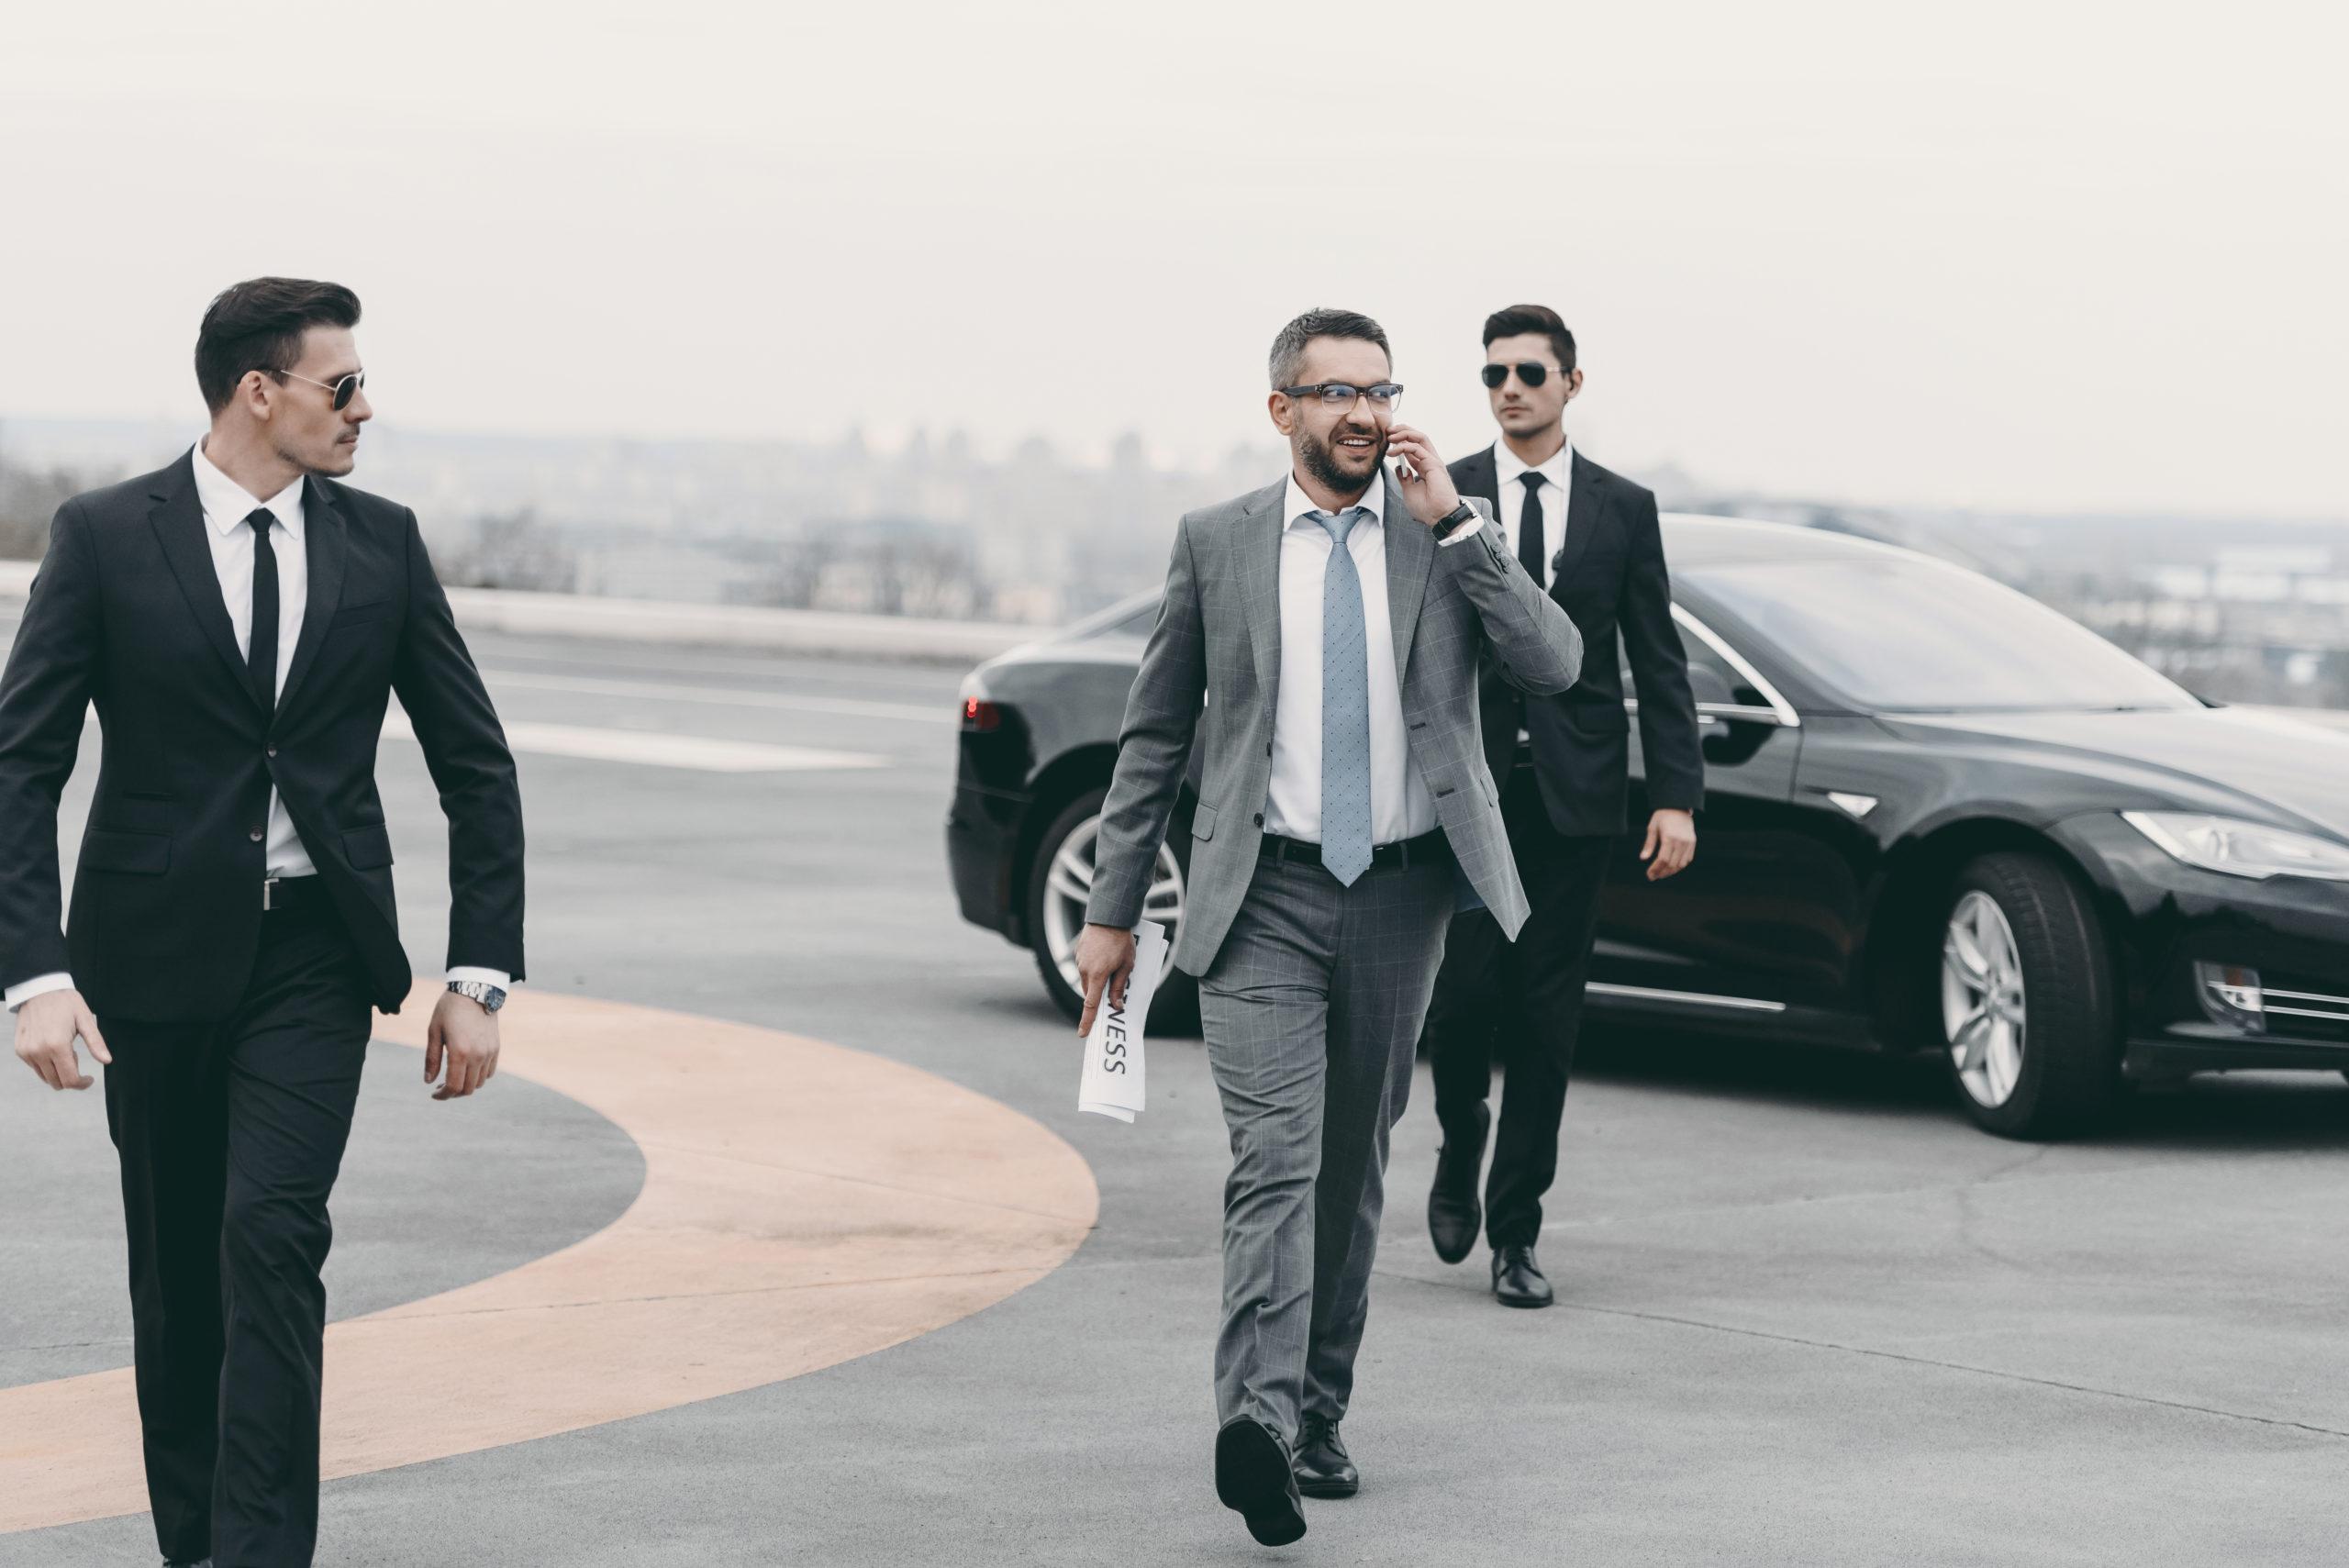 bodyguards on helipad